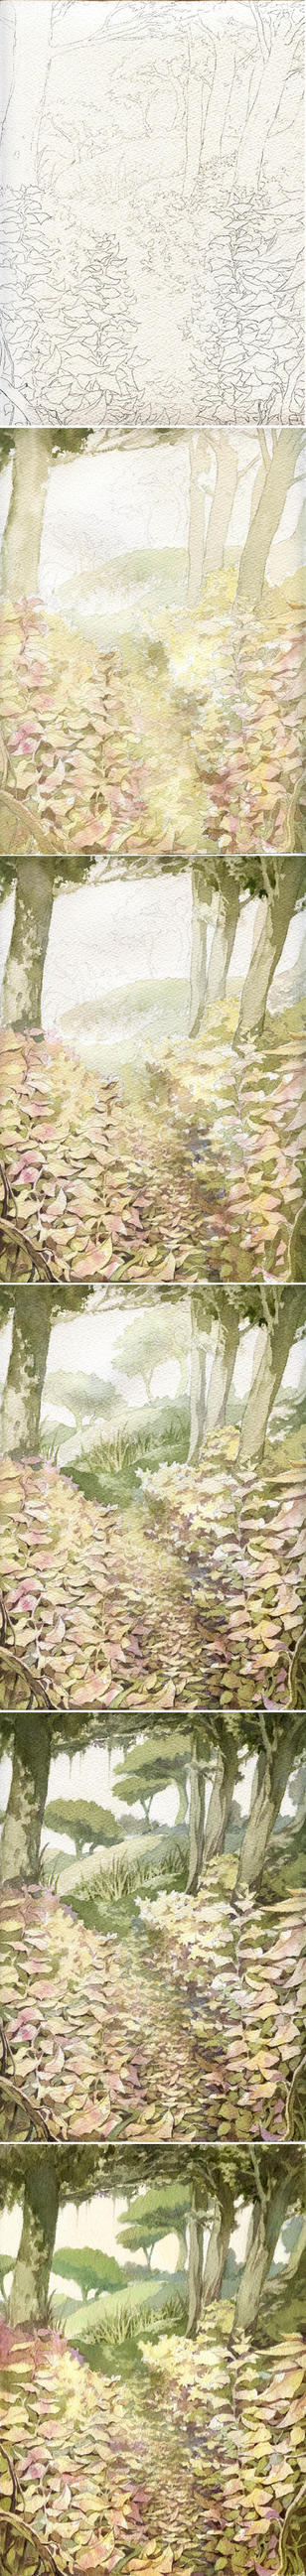 Tutorial de un watercolor landscape by ChencoIlufi